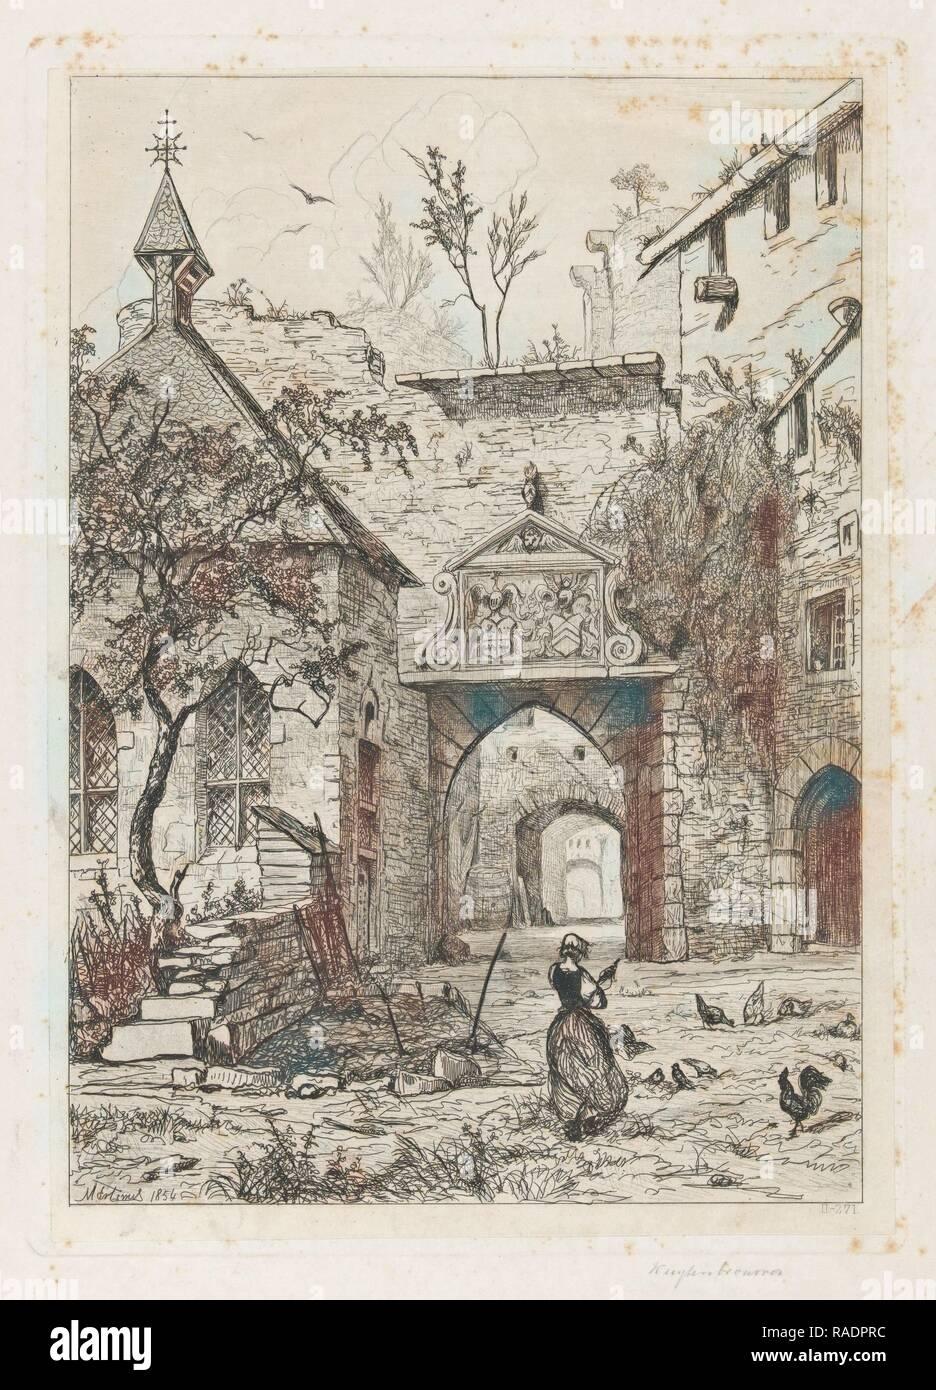 Entrance to the castle of Hollenfeltz, Martinus Antonius Kuytenbrouwer (jr.), 185. Reimagined by Gibon. Classic art reimagined - Stock Image